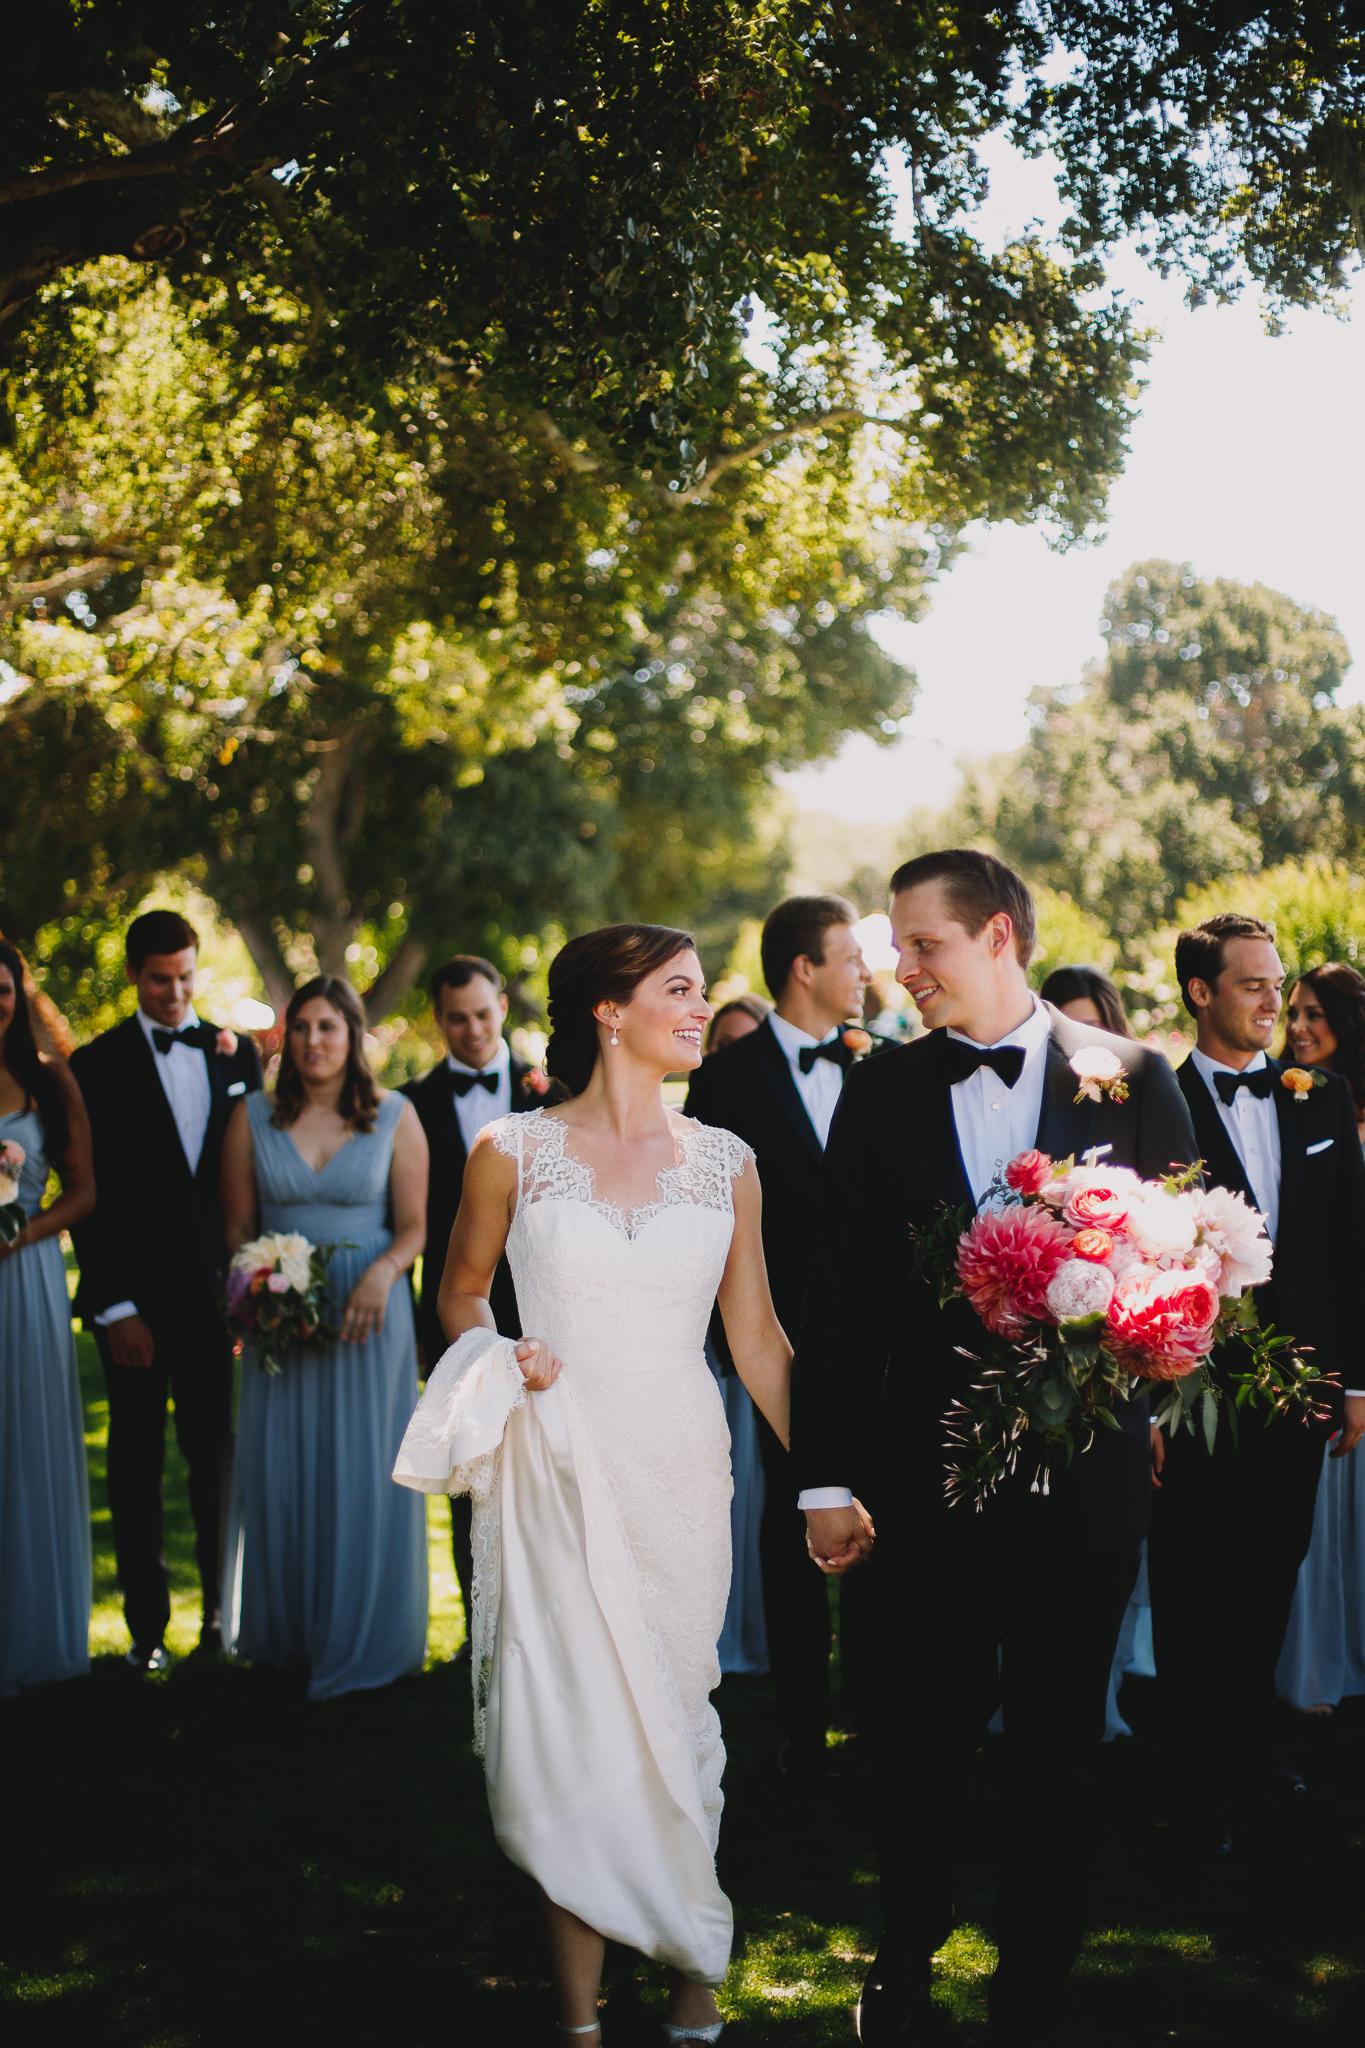 Archer Inspired Photography Carmel California Wedding Lifestyle Documentary Photographer Bride and Groom-11.jpg